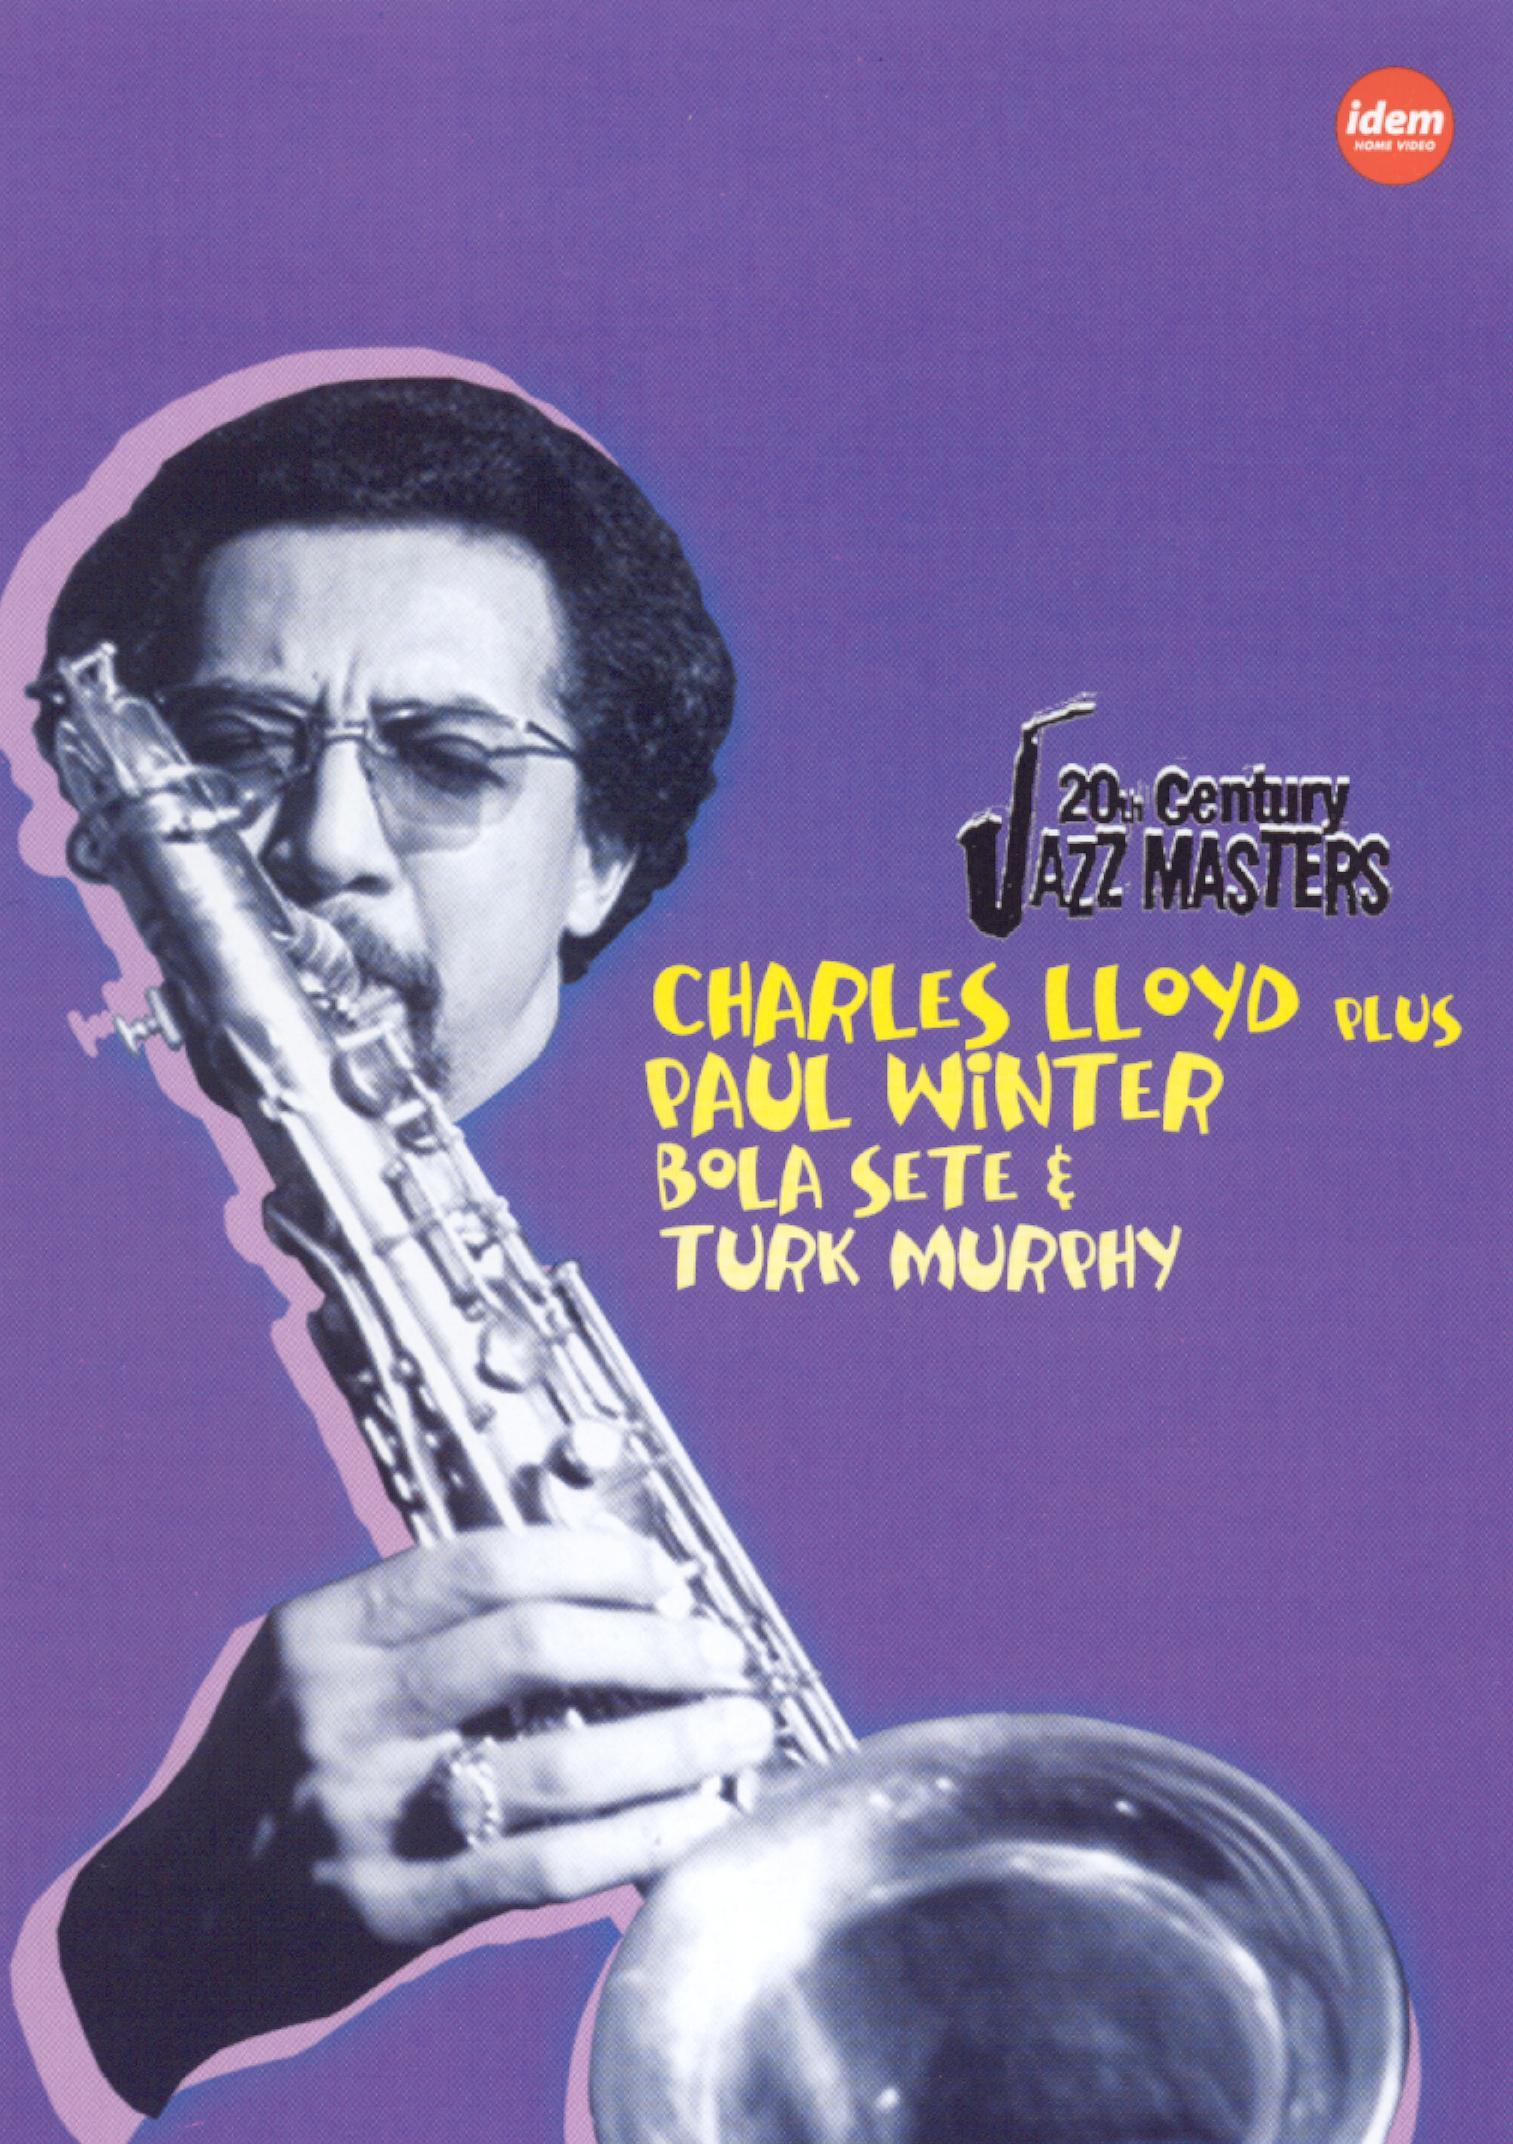 20th Century Jazz Masters: Charles Lloyd/Paul Winter/Bola Sete/Turk Murphy